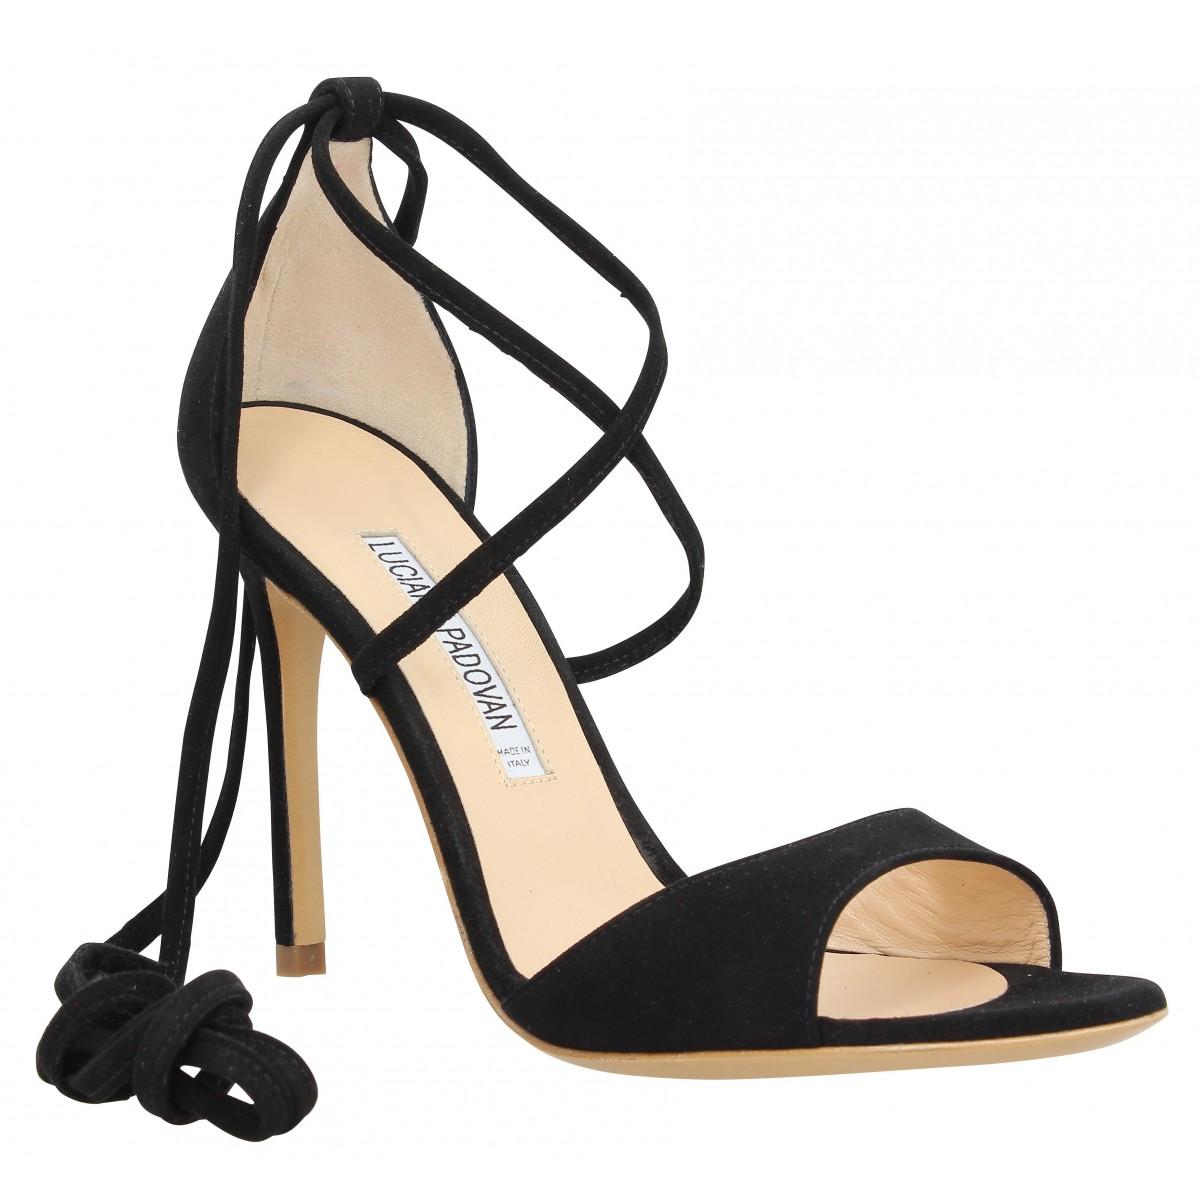 Sandales talons LUCIANO PADOVAN Mirand velours Femme Noir